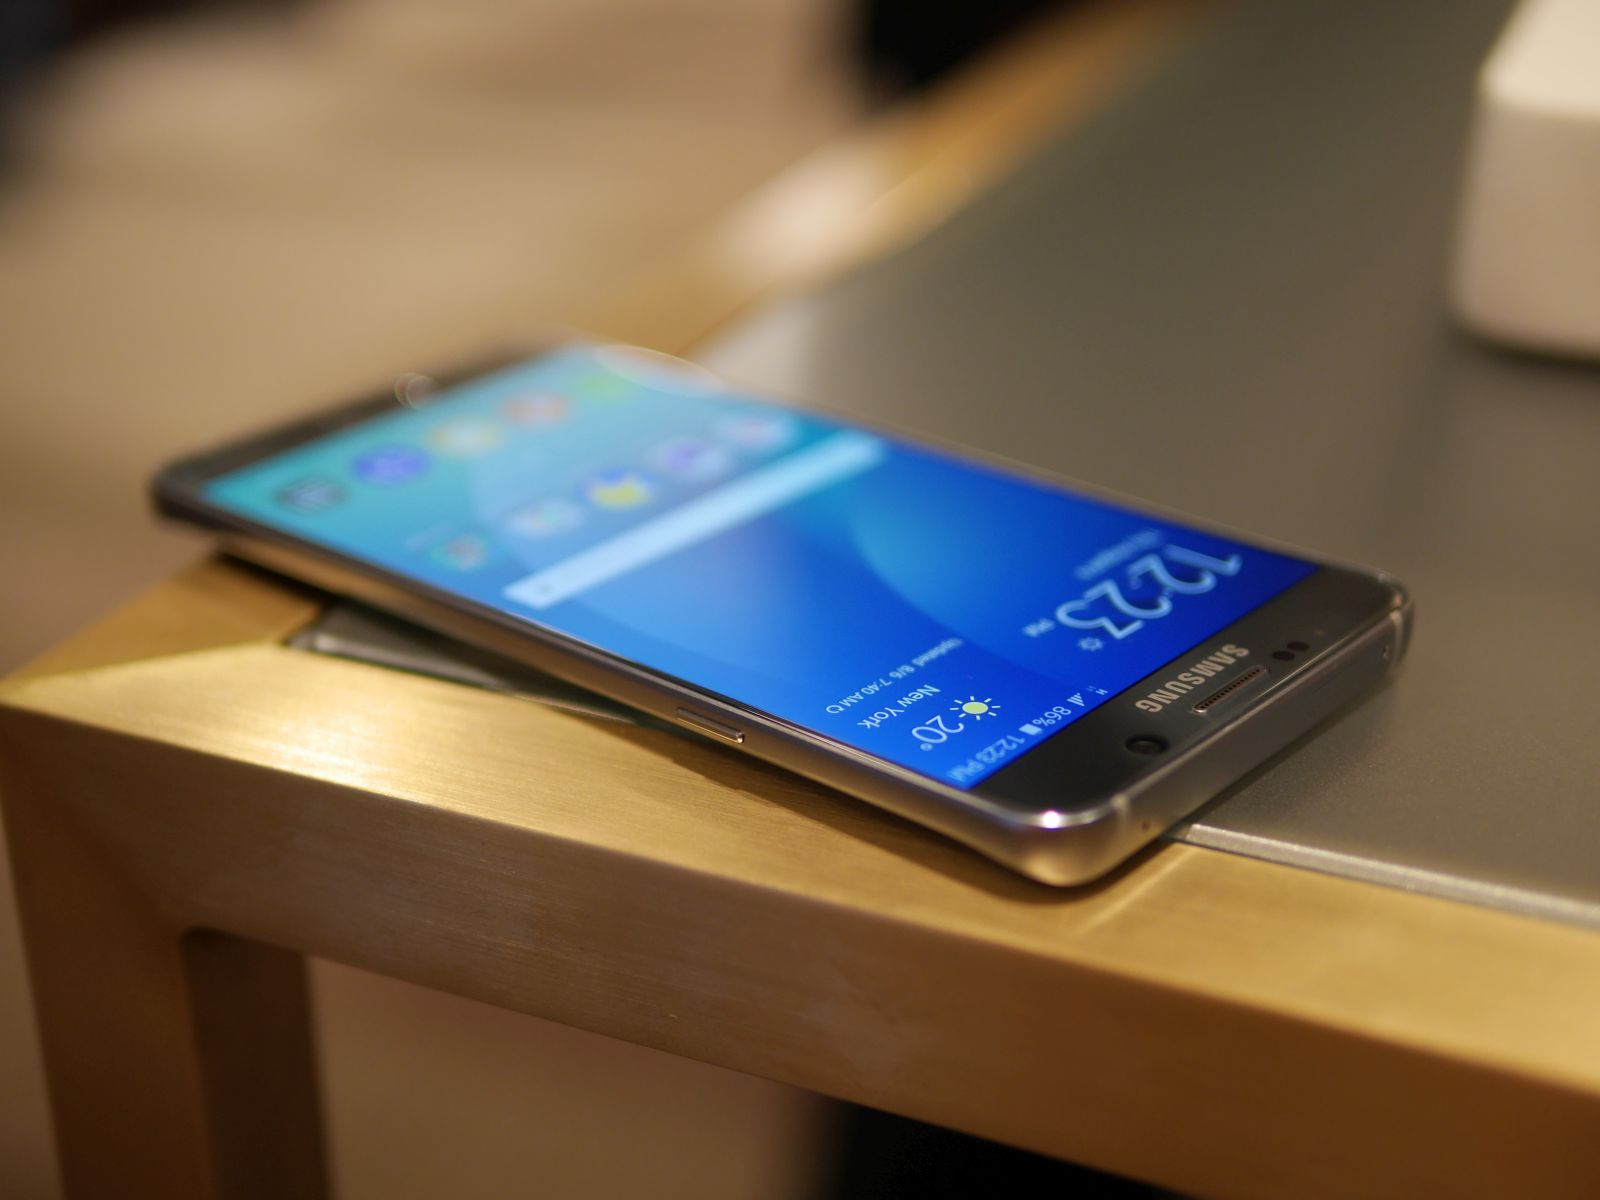 Samsung Galaxy S6 edge Plus 17